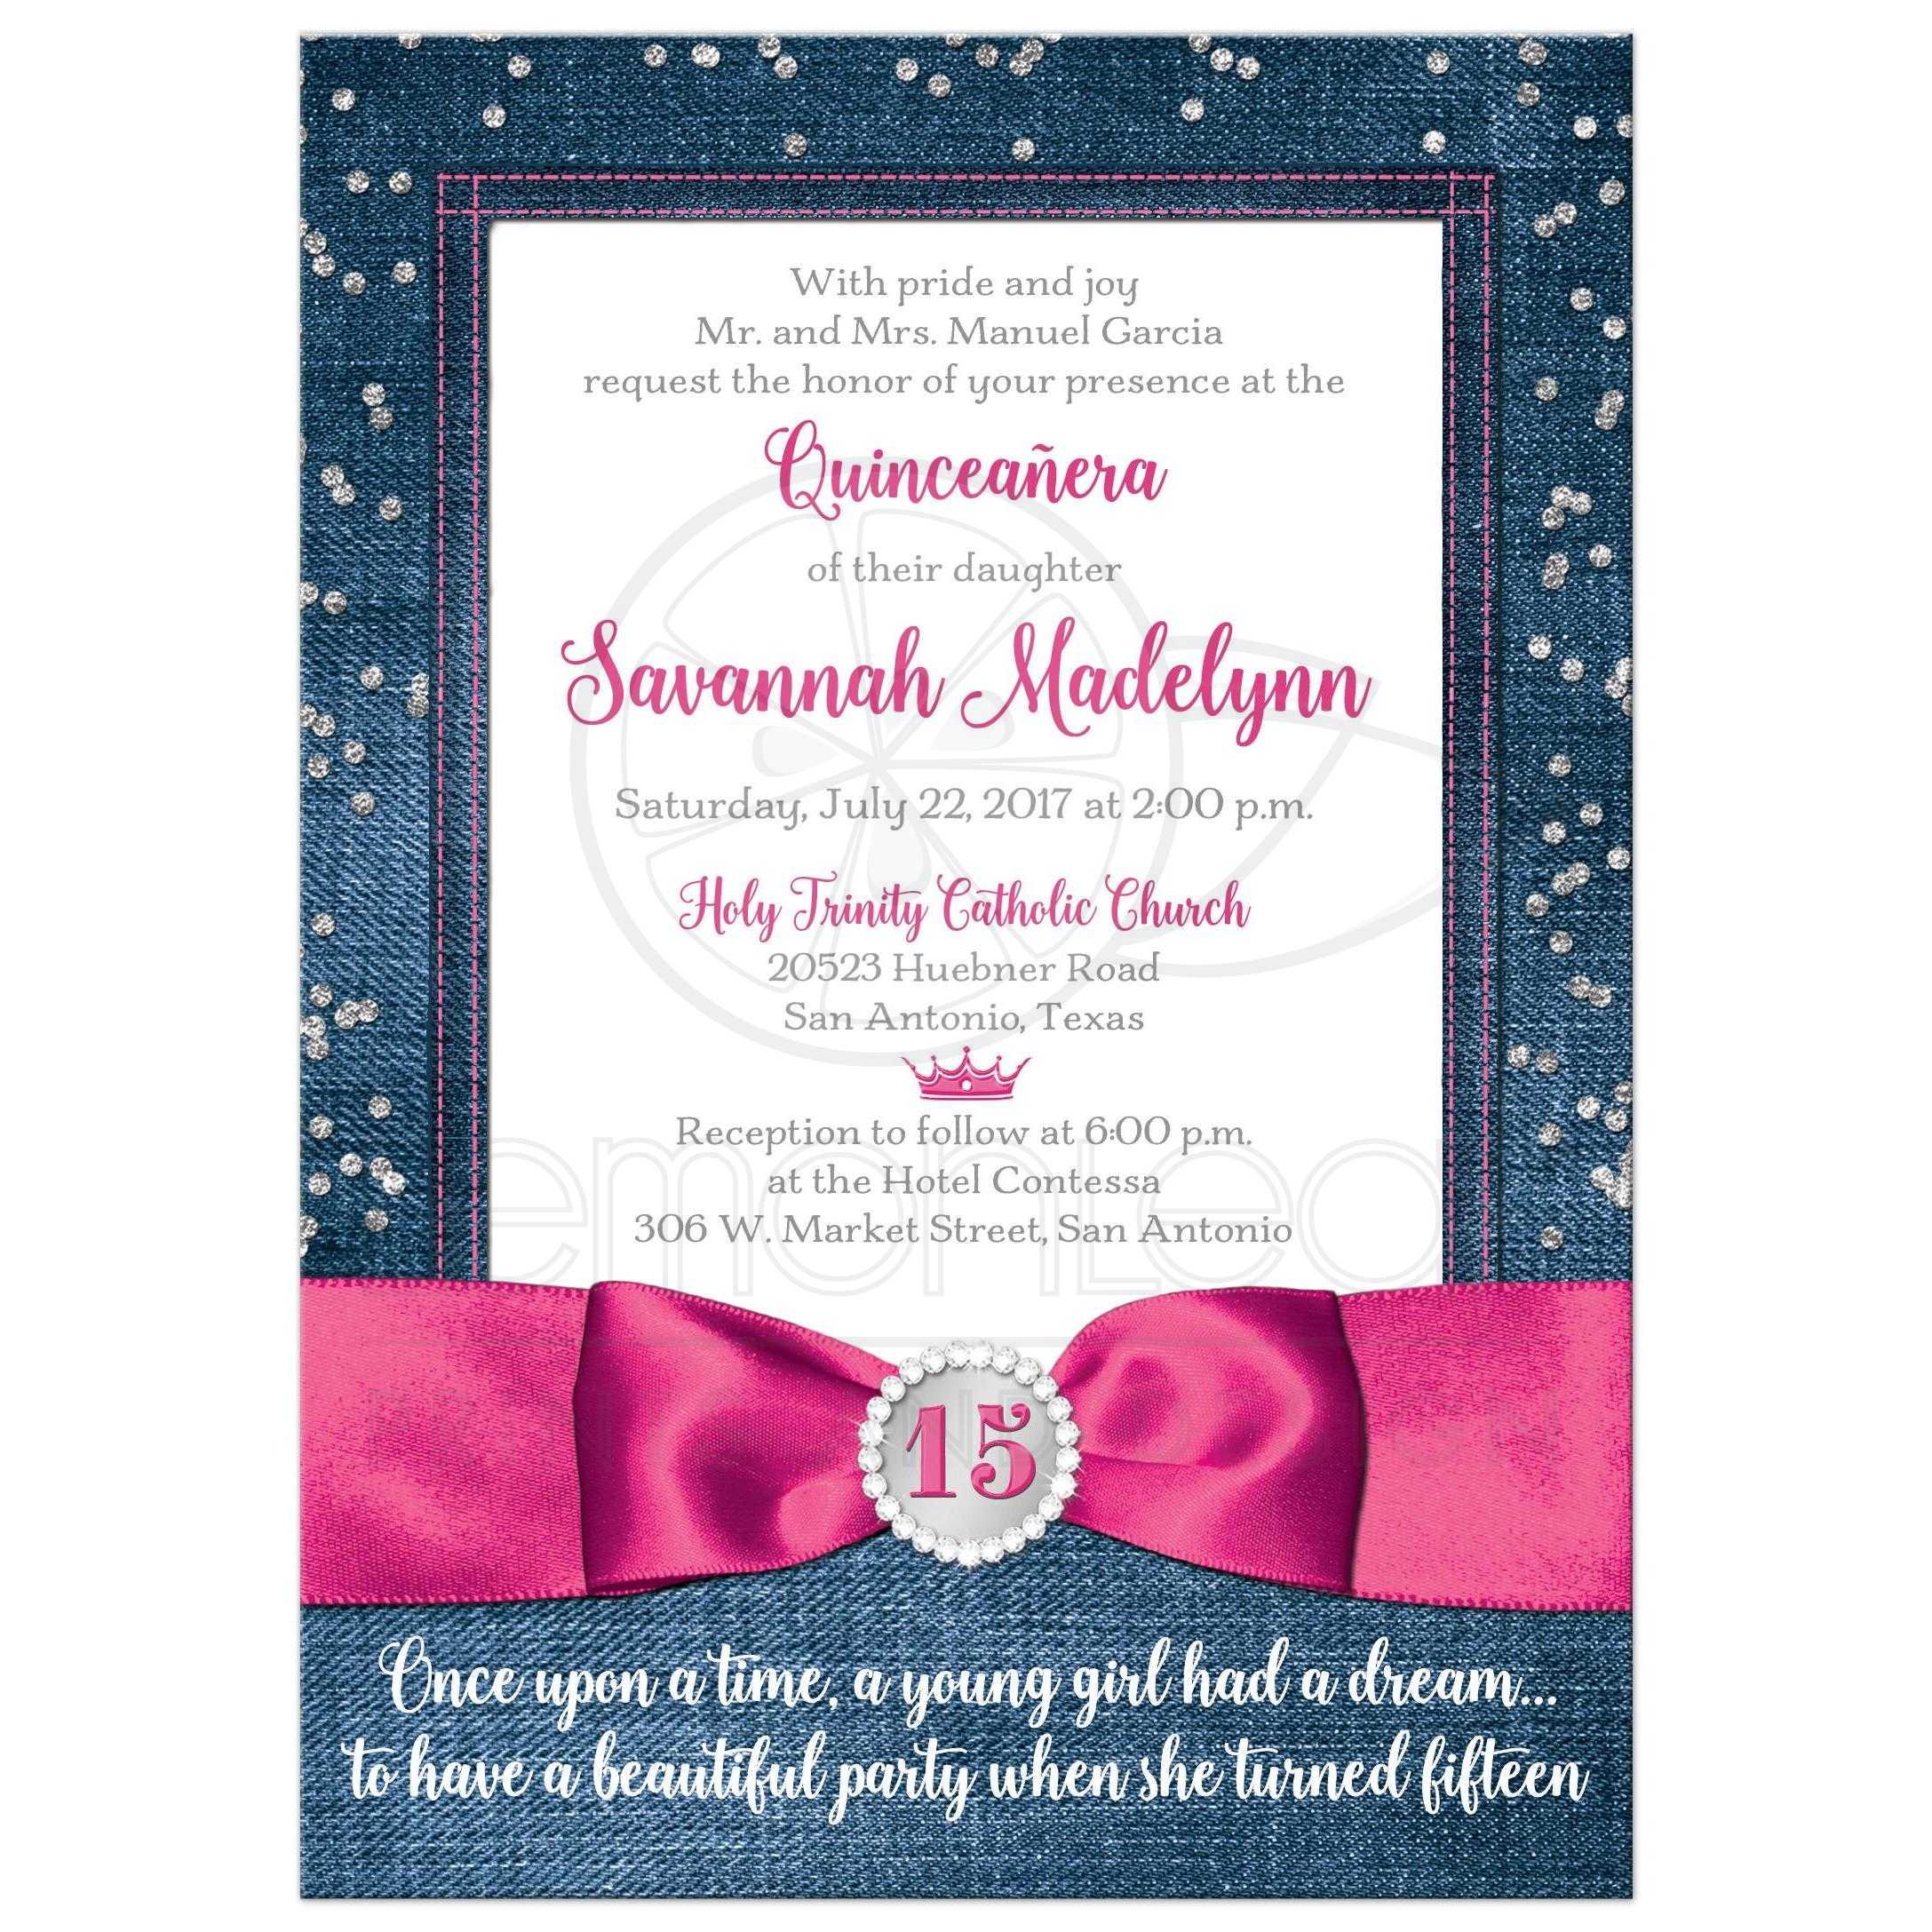 Quinceaera Invitation Denim Diamonds Printed Pink Ribbon Bow